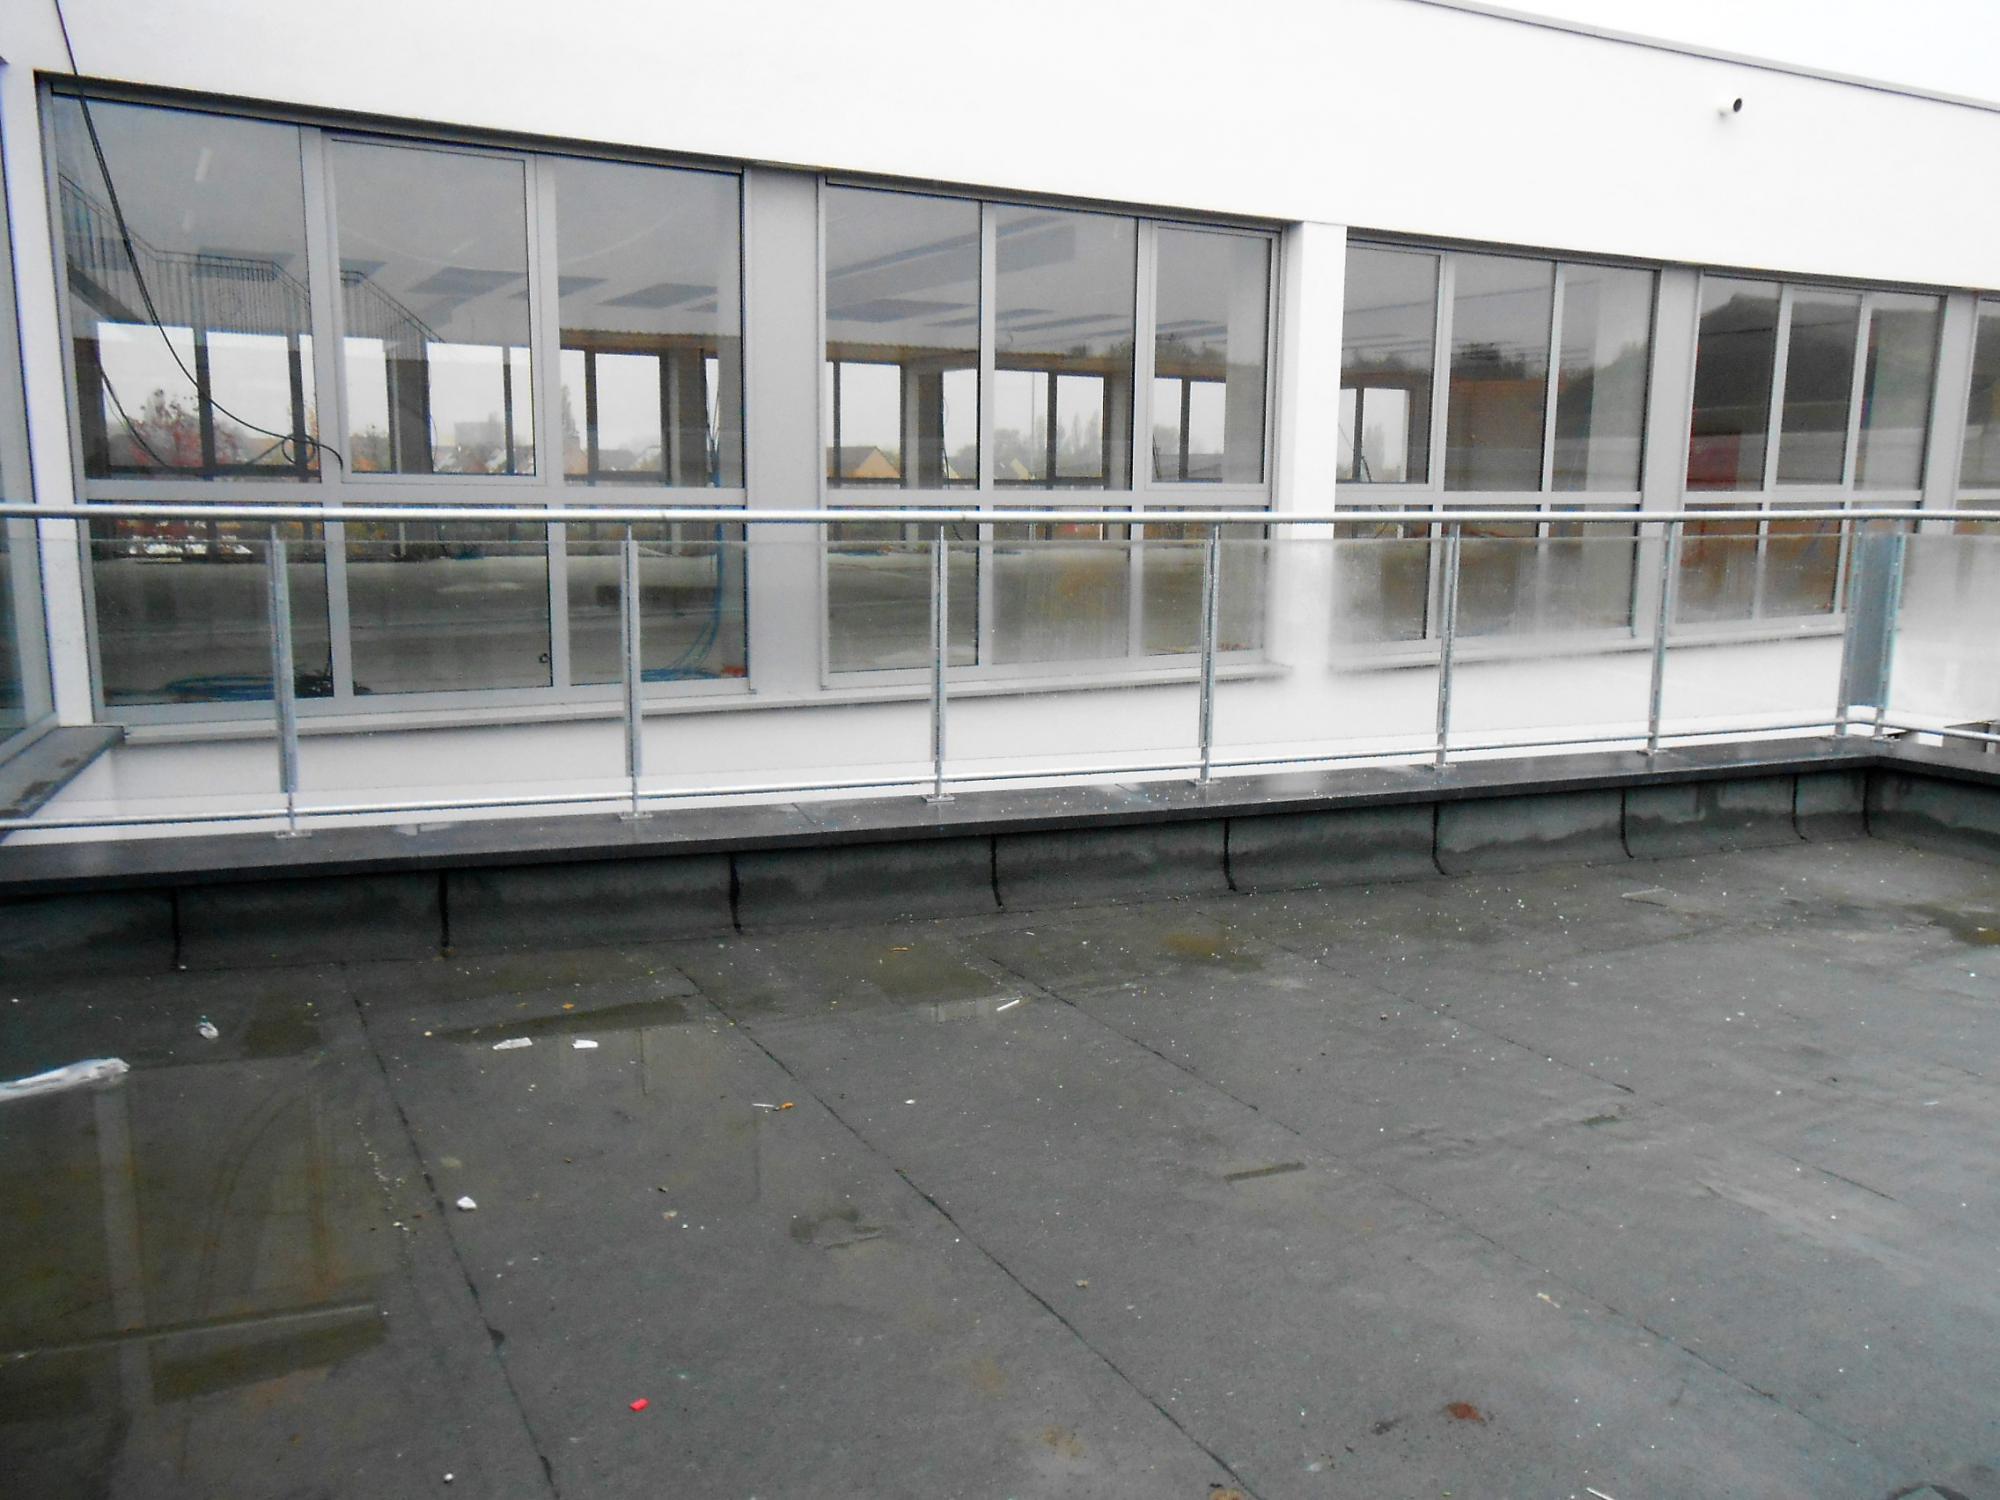 Project te koop in sint niklaas ref de woninggalerij